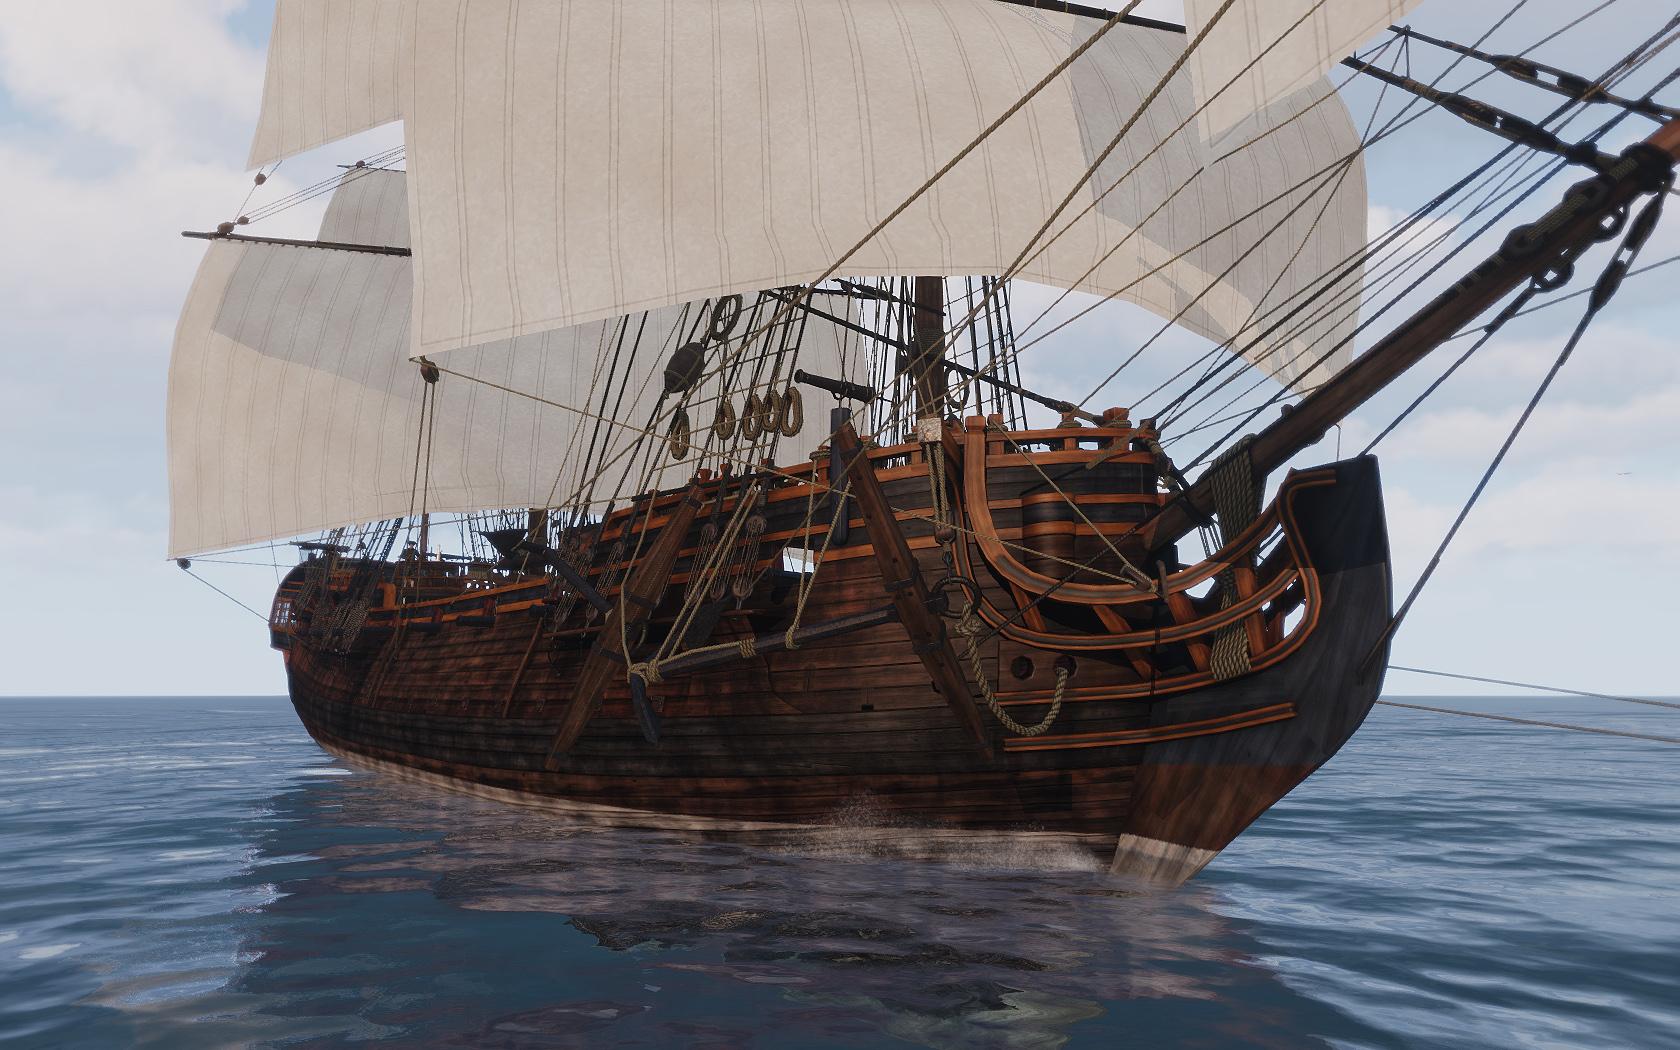 1715_ship2.jpg